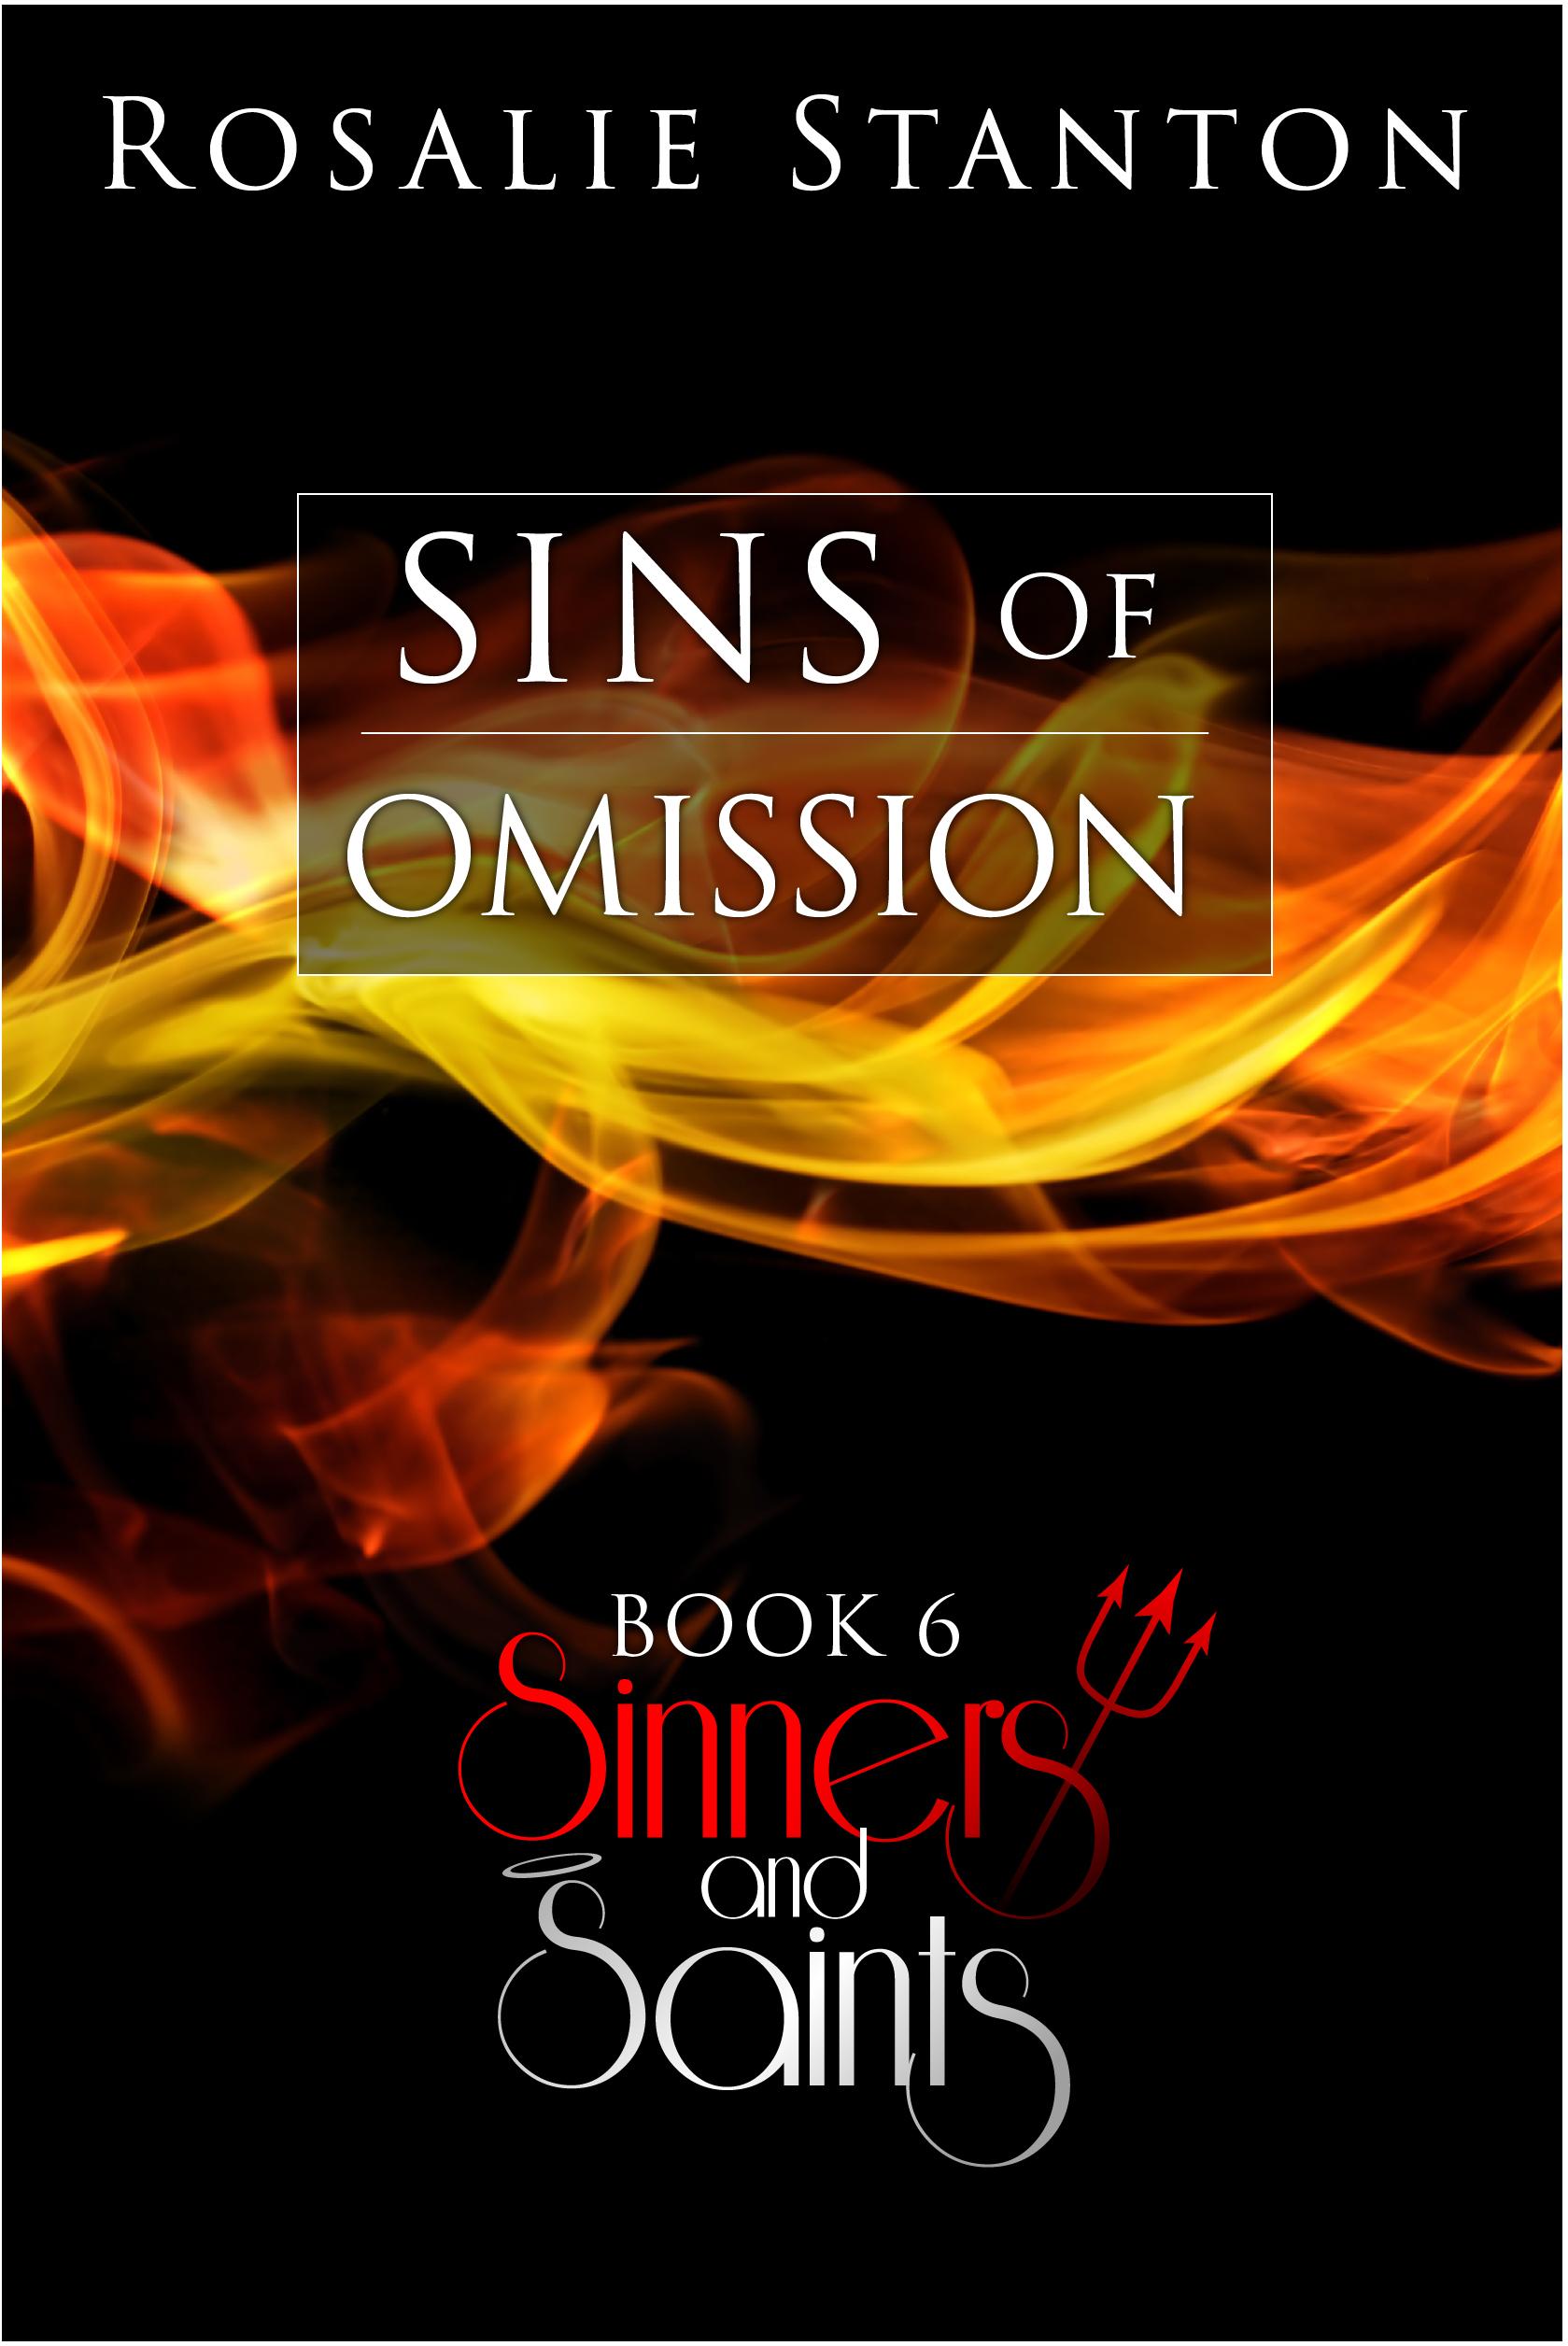 6 Sins of Omission-01.jpg